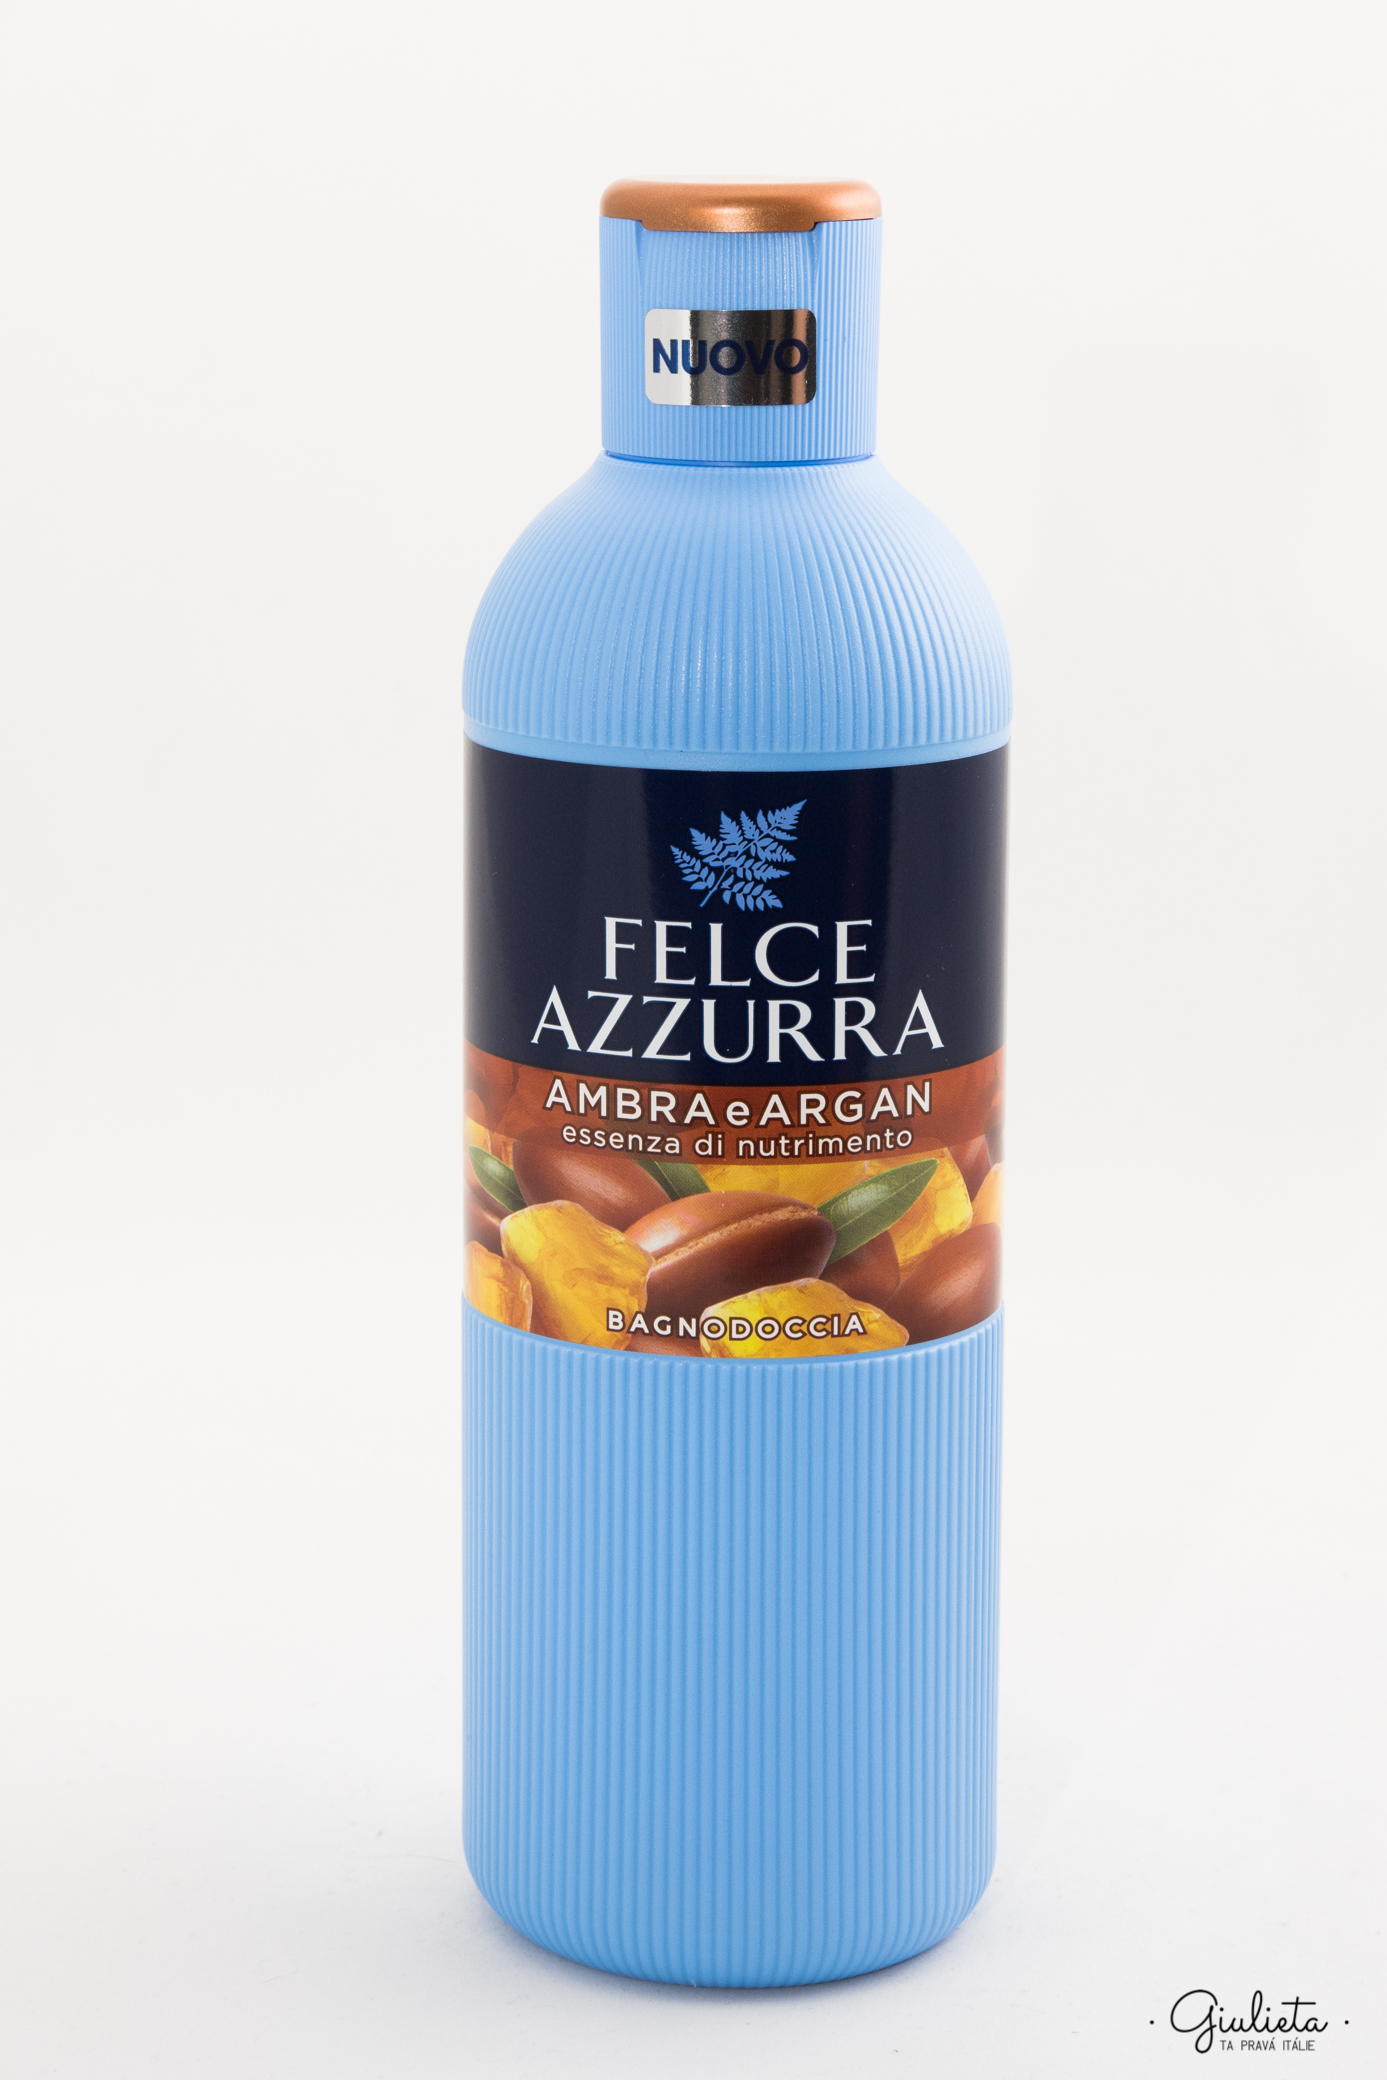 Felce Azzurra sprchový gel/pěna do koupele Ambra e Argan, 650 ml